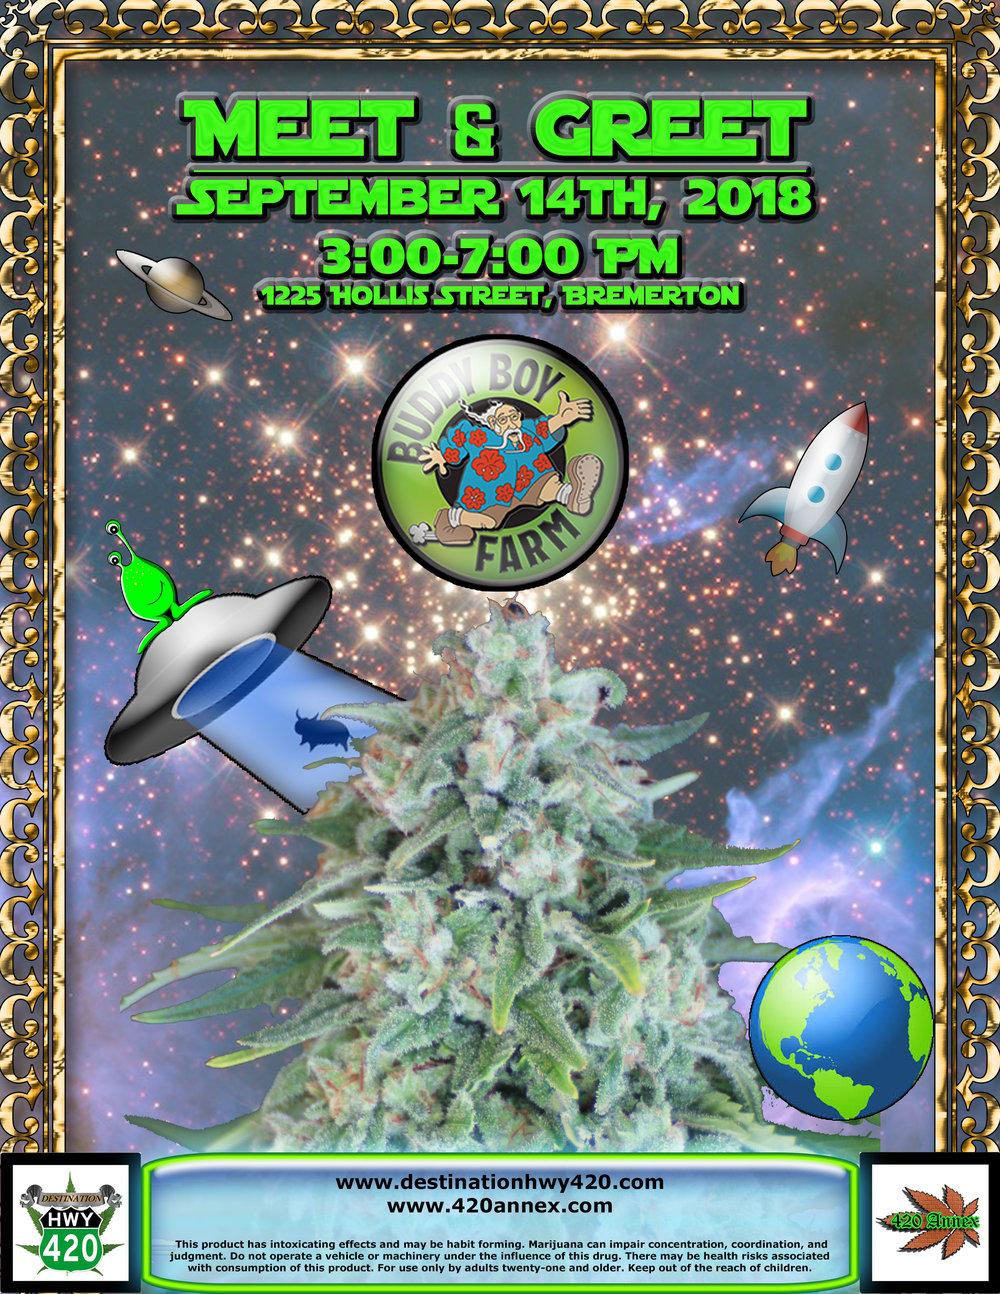 Buddy Boy Farms- Meet & Greet Marijuana Producer/Processor